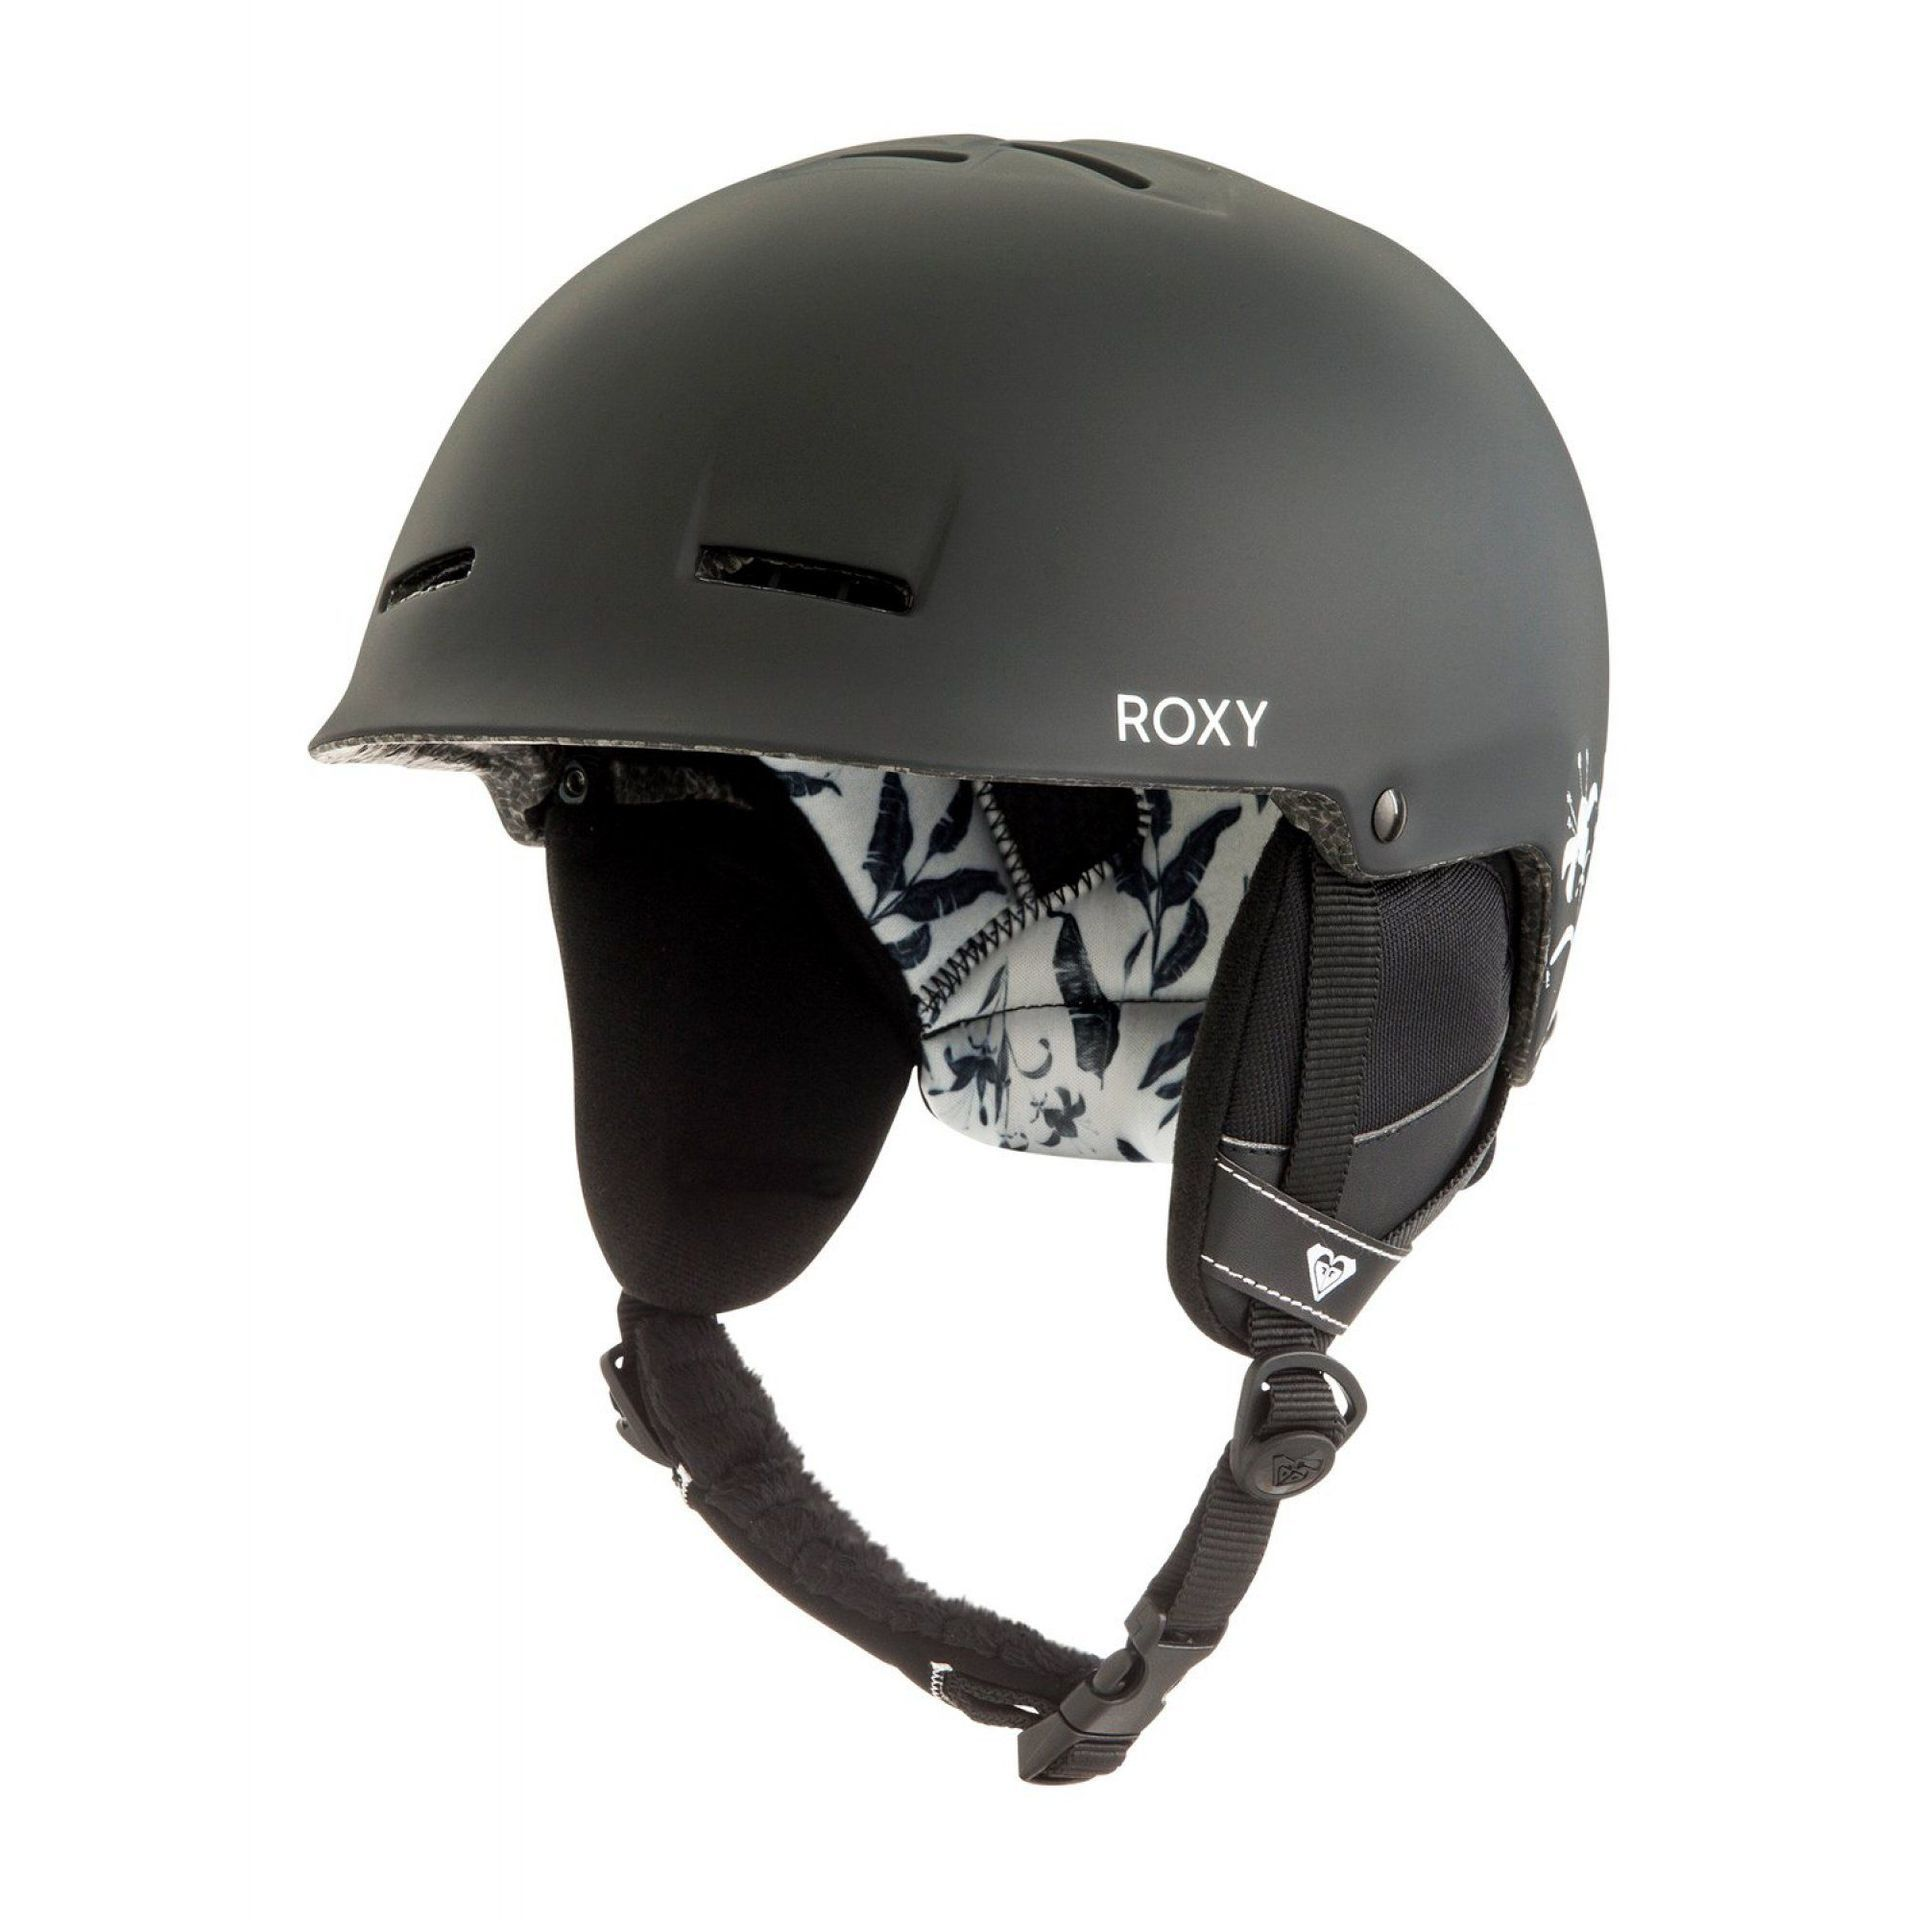 KASK ROXY AVERY ERJTL03031 KVJ2